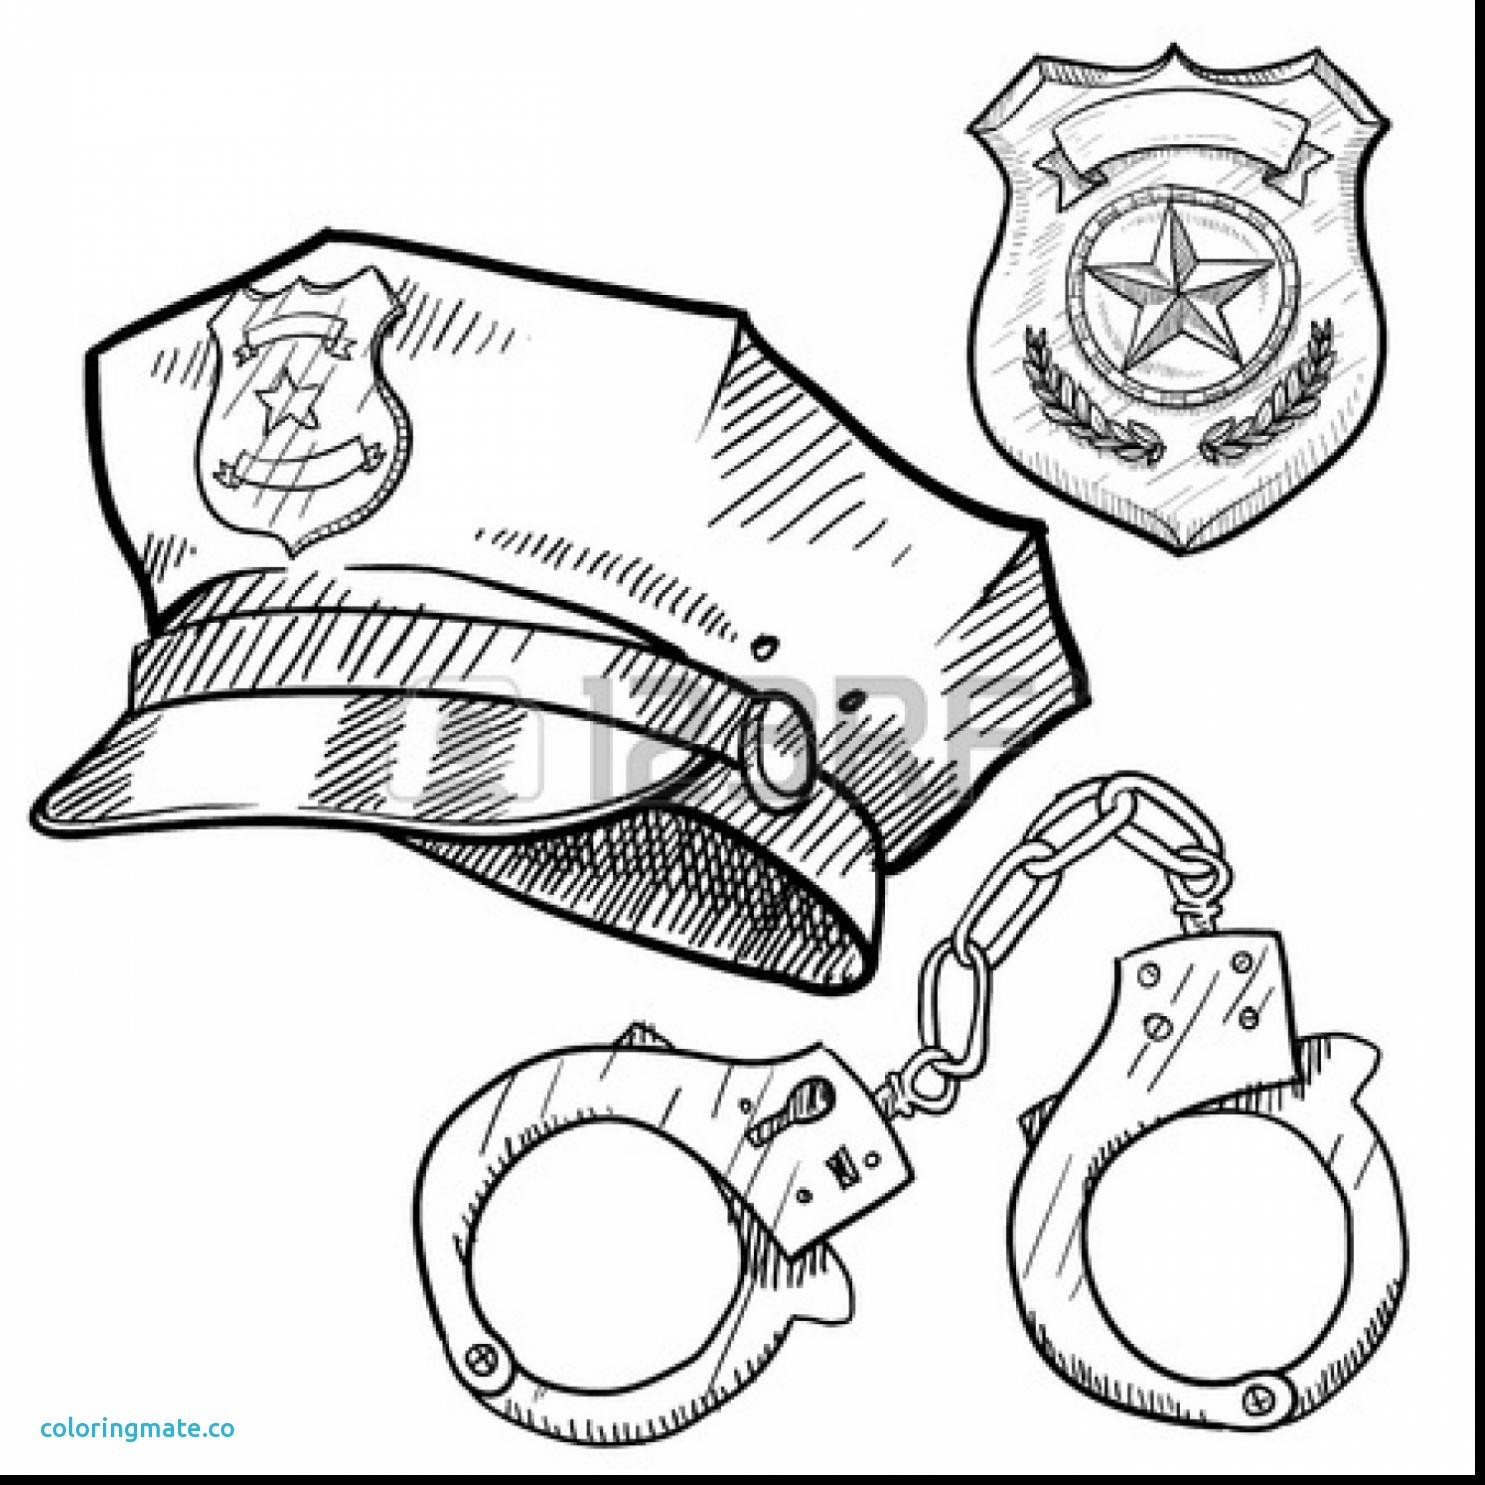 Police Badge Drawing At Getdrawings